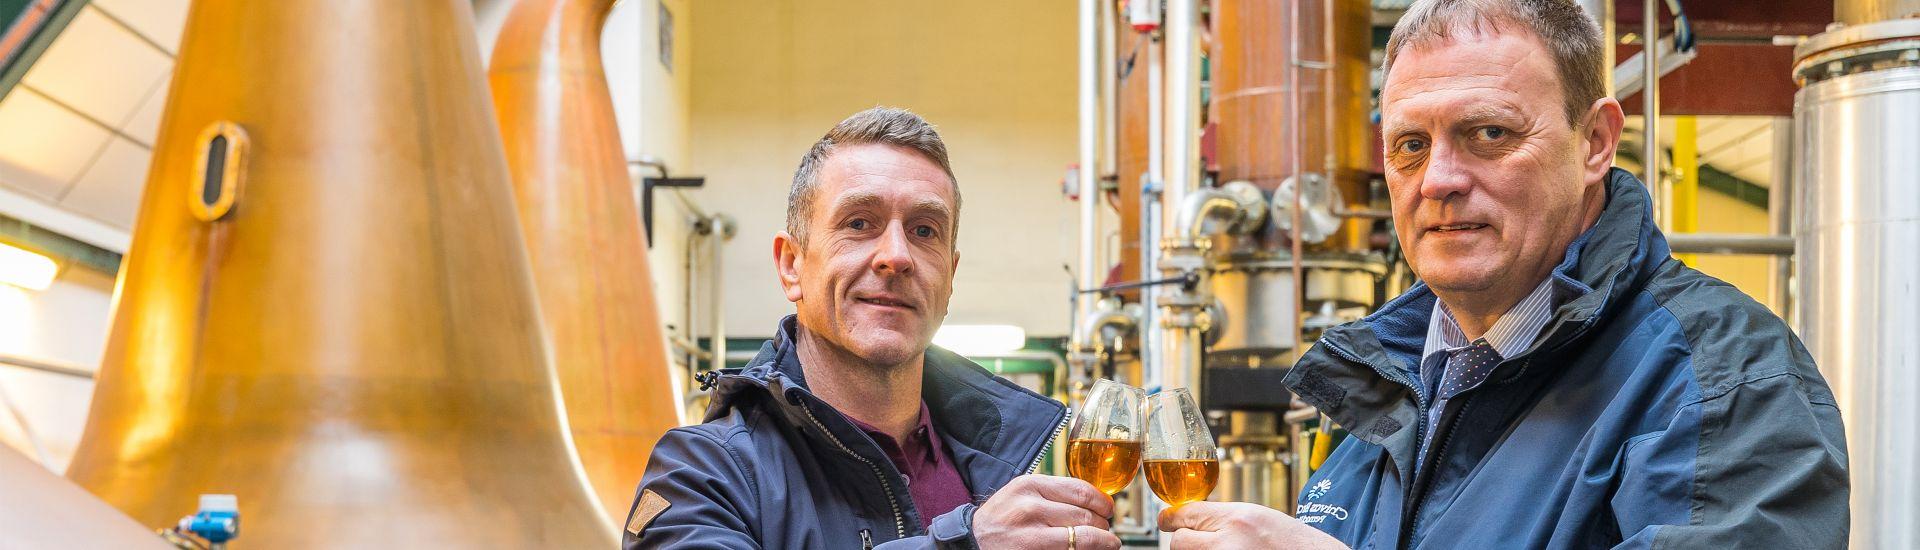 carbon-reducing-connection-highlands-distillery-case-banner.jpg